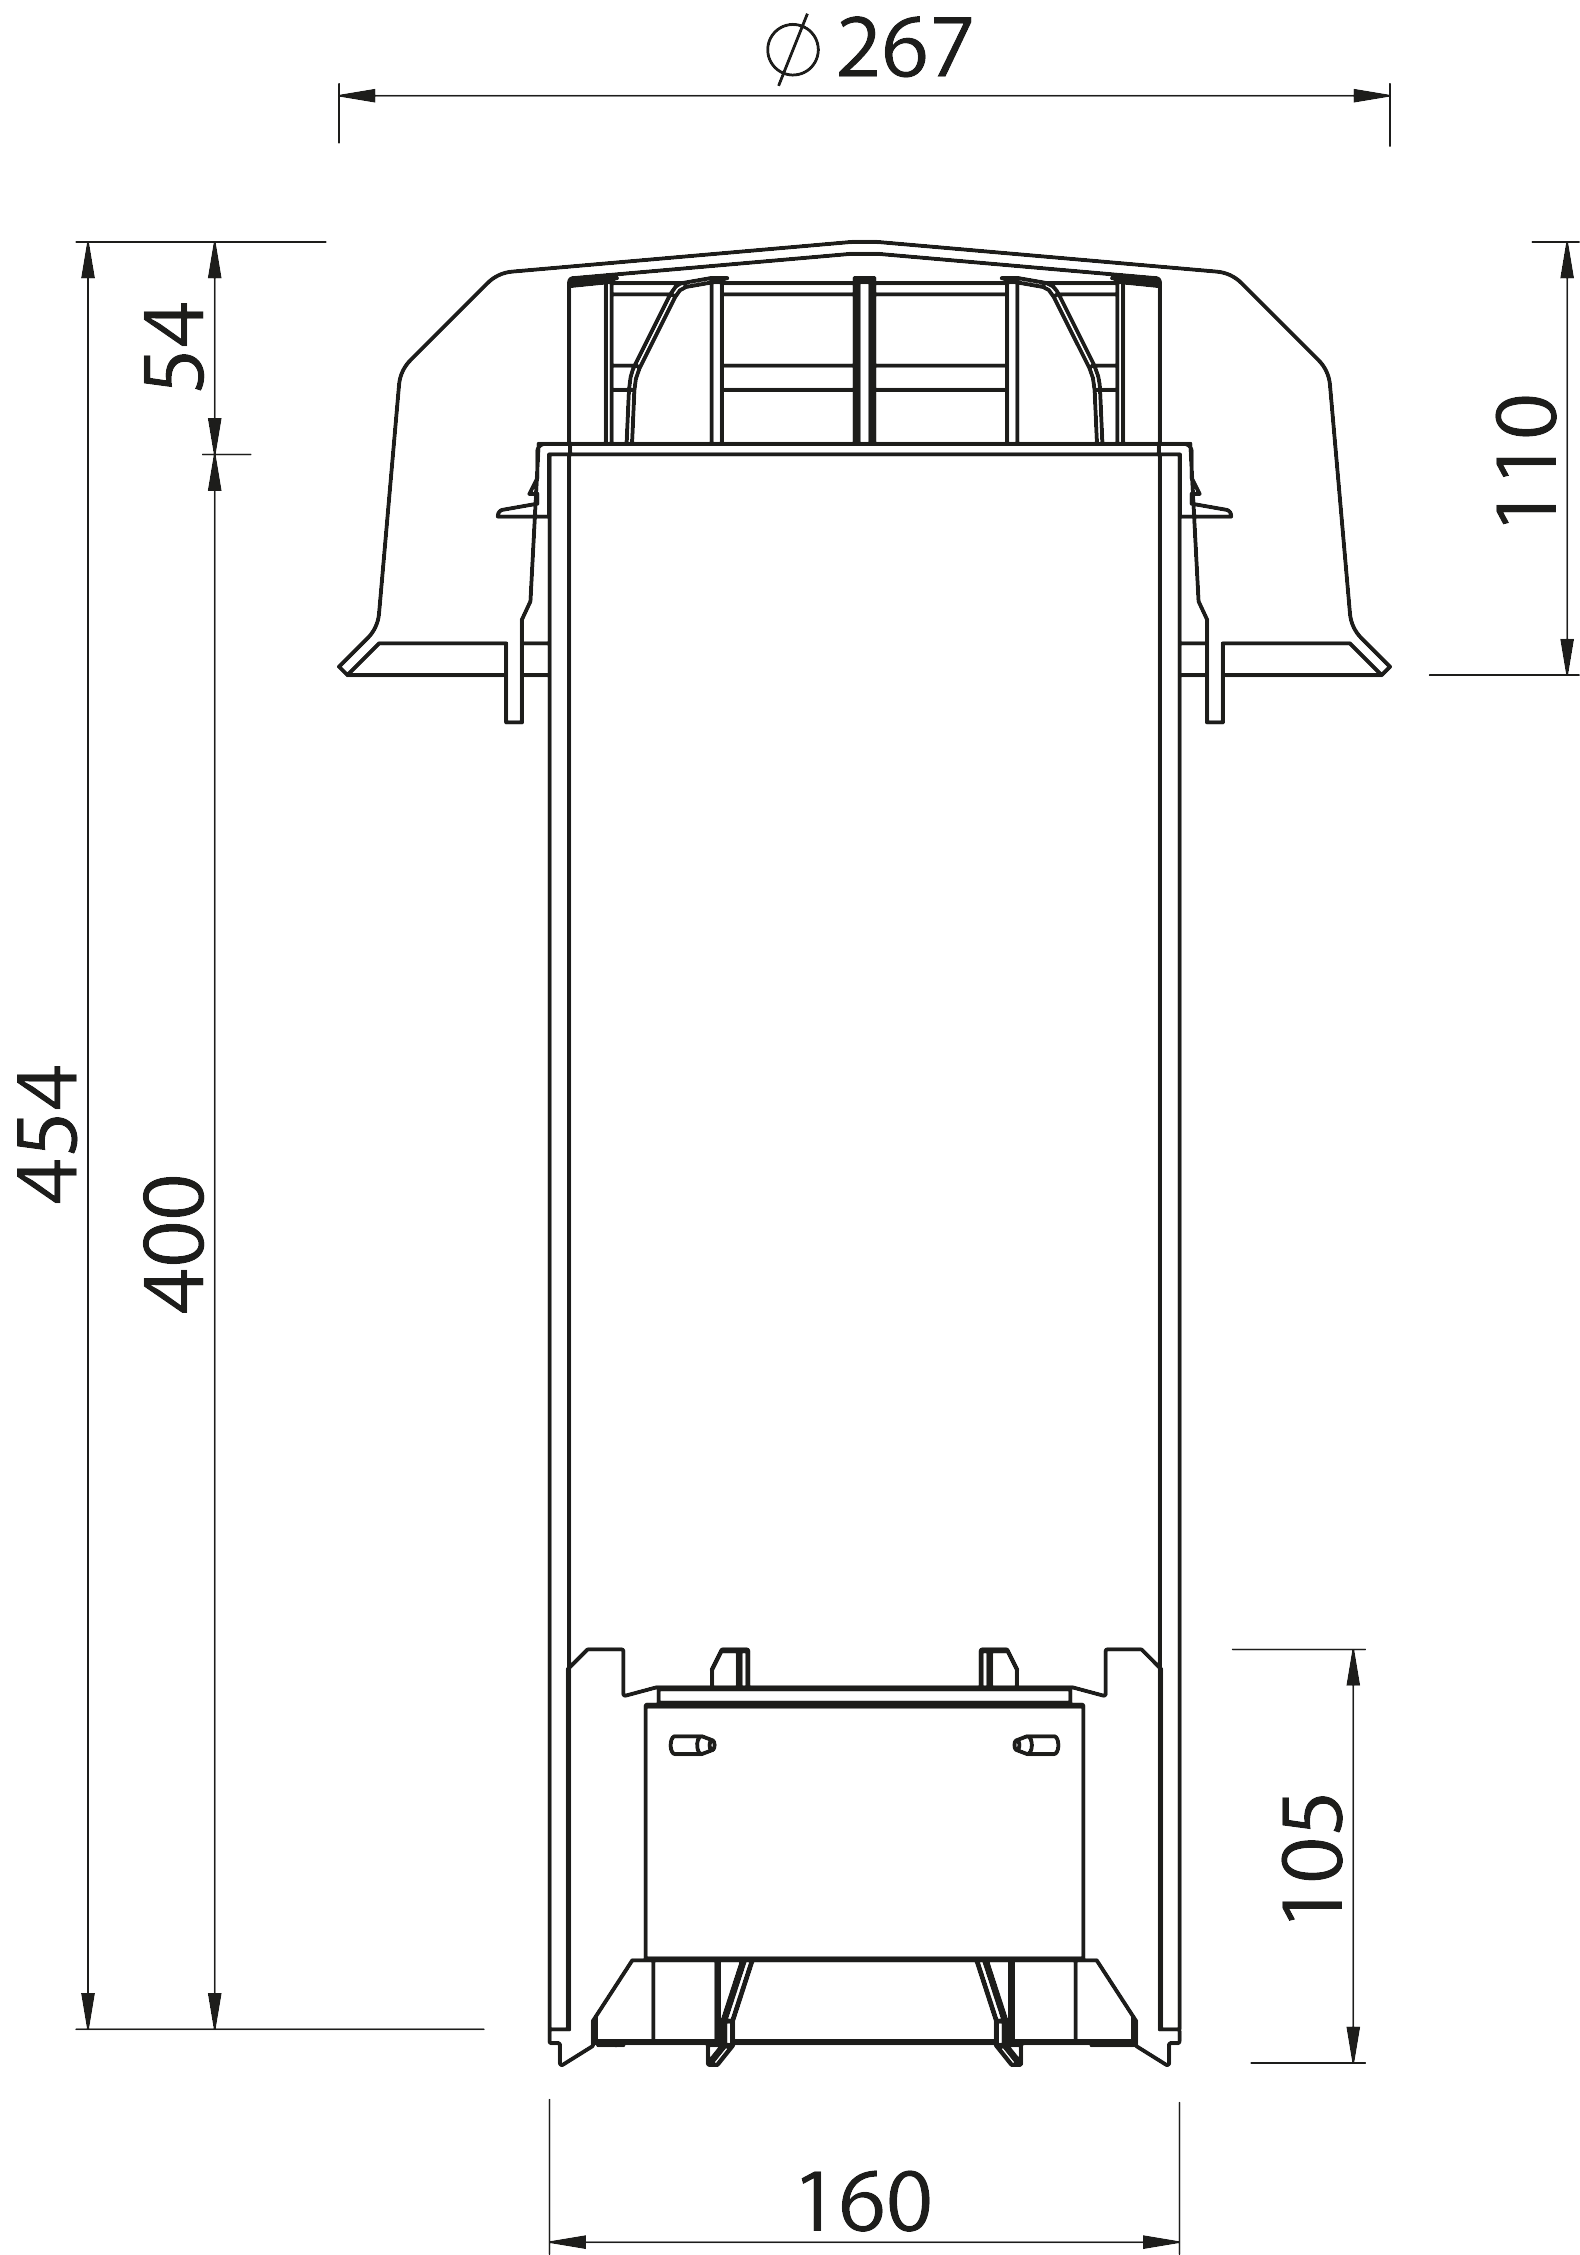 SitaVent  - Kondensat deflektörü